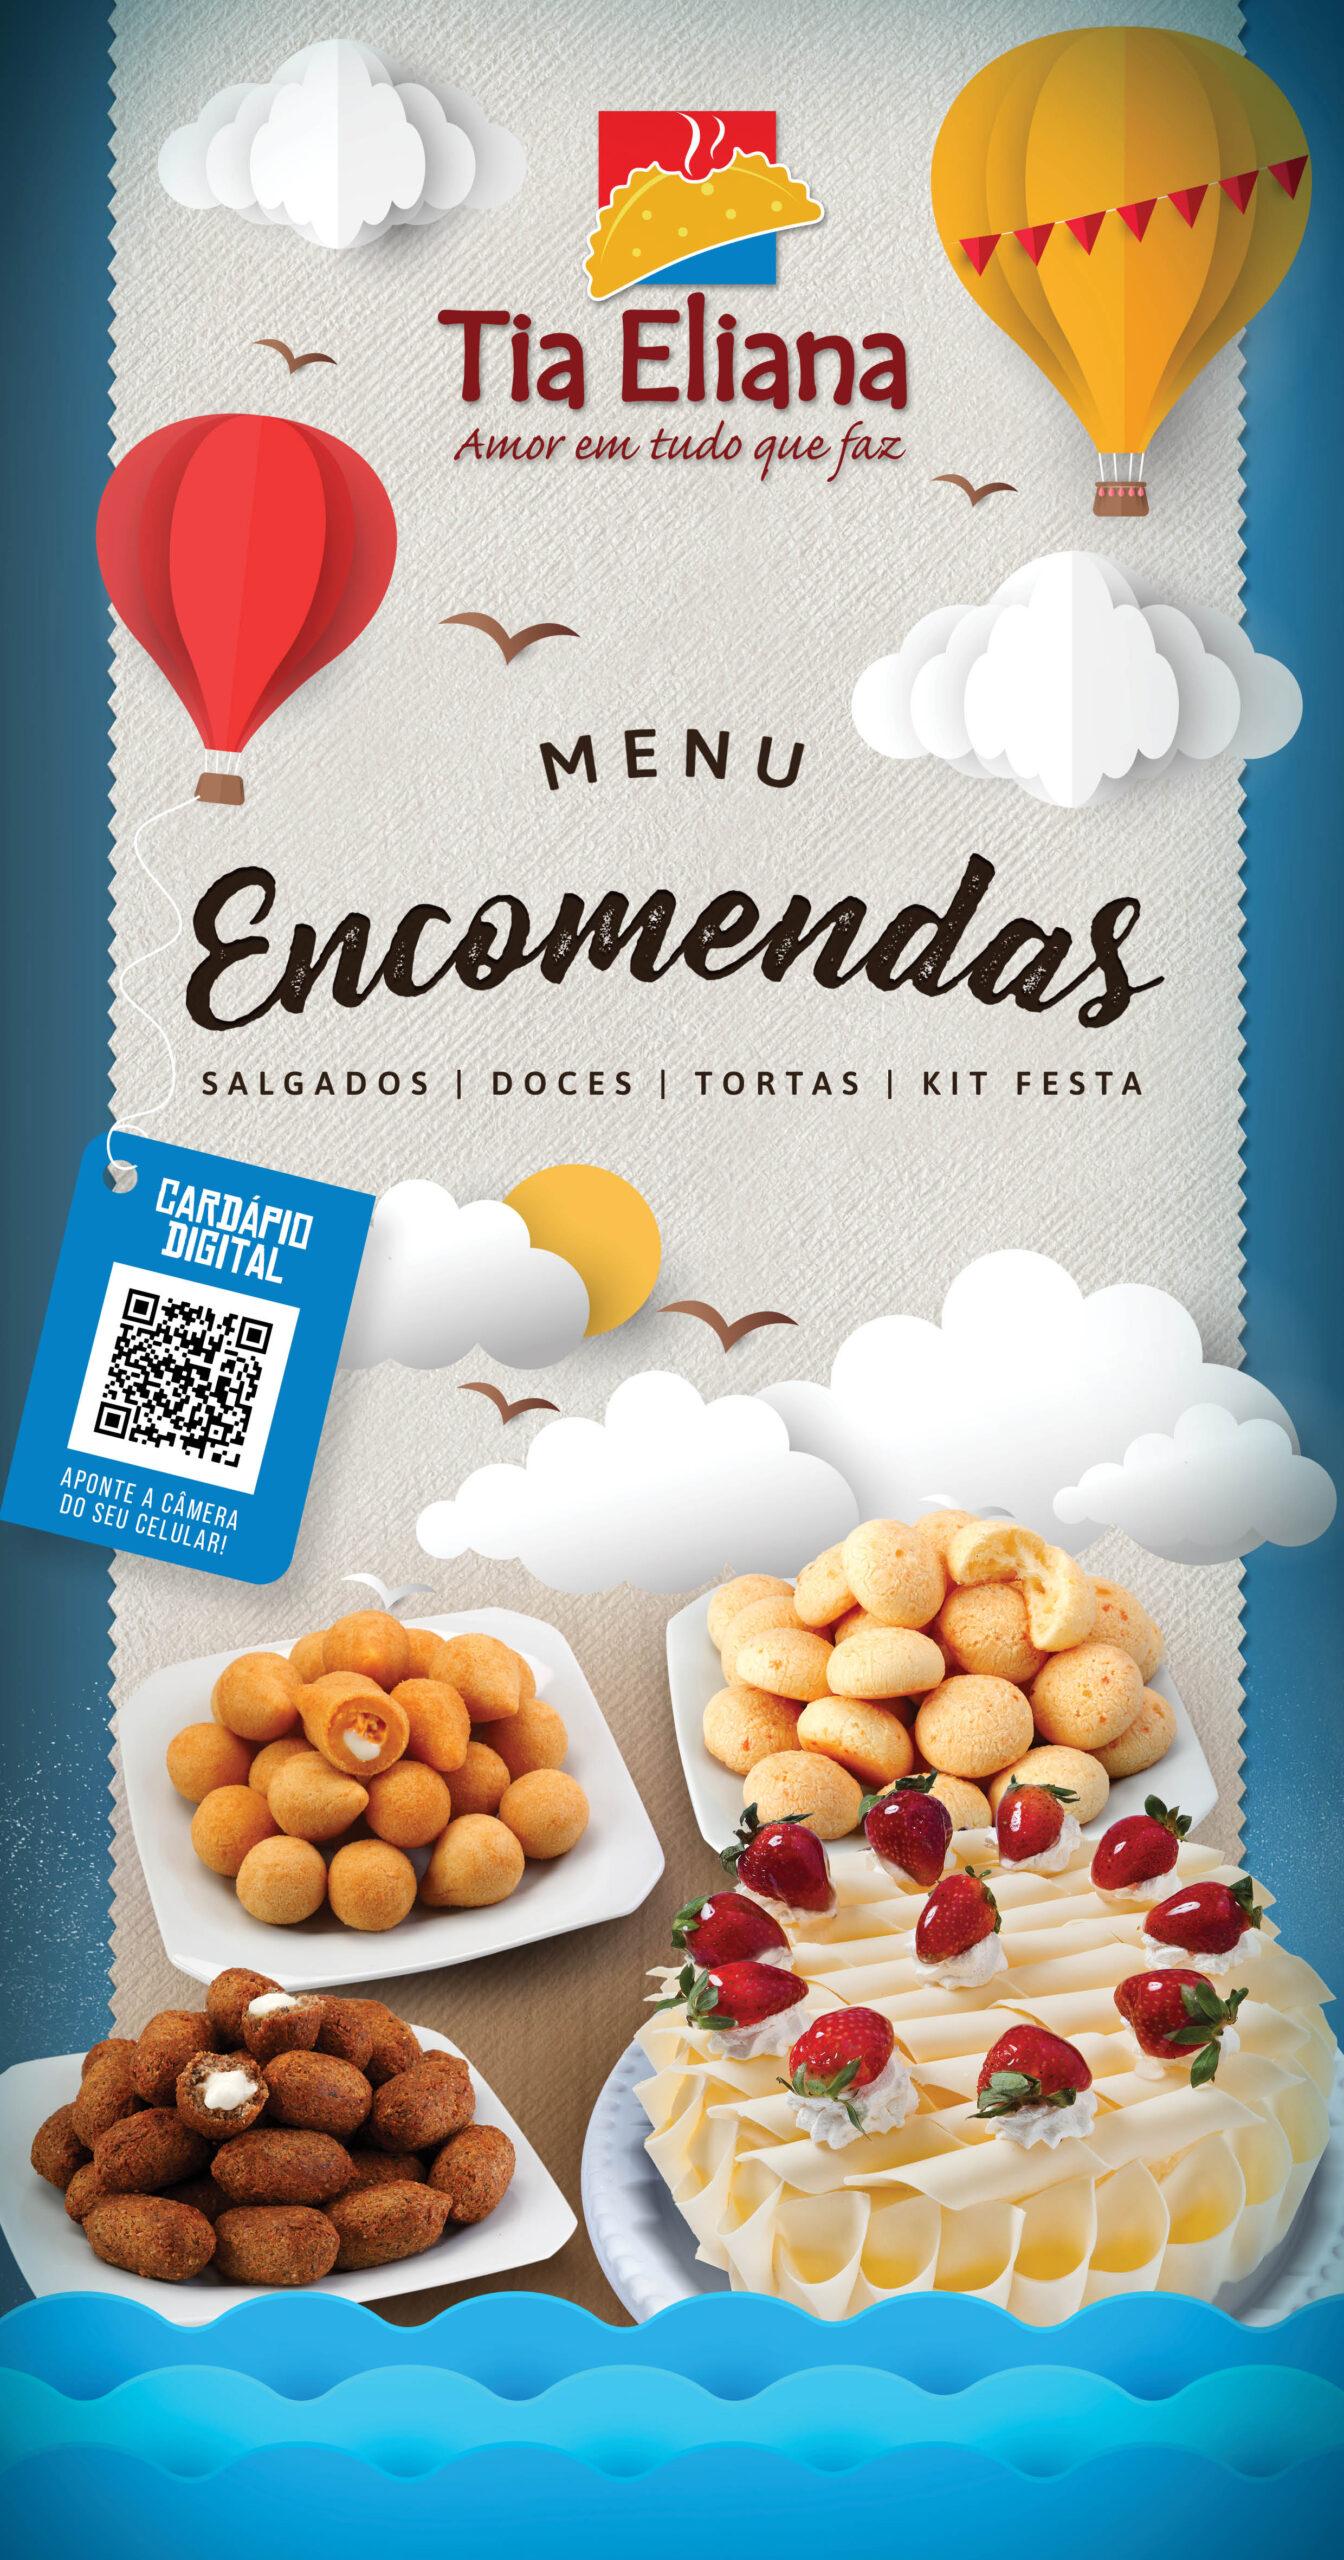 cardapio_encomendas_40x21cm_tia_eliana_interior_caete-scaled Encomendas - Itabira - JP